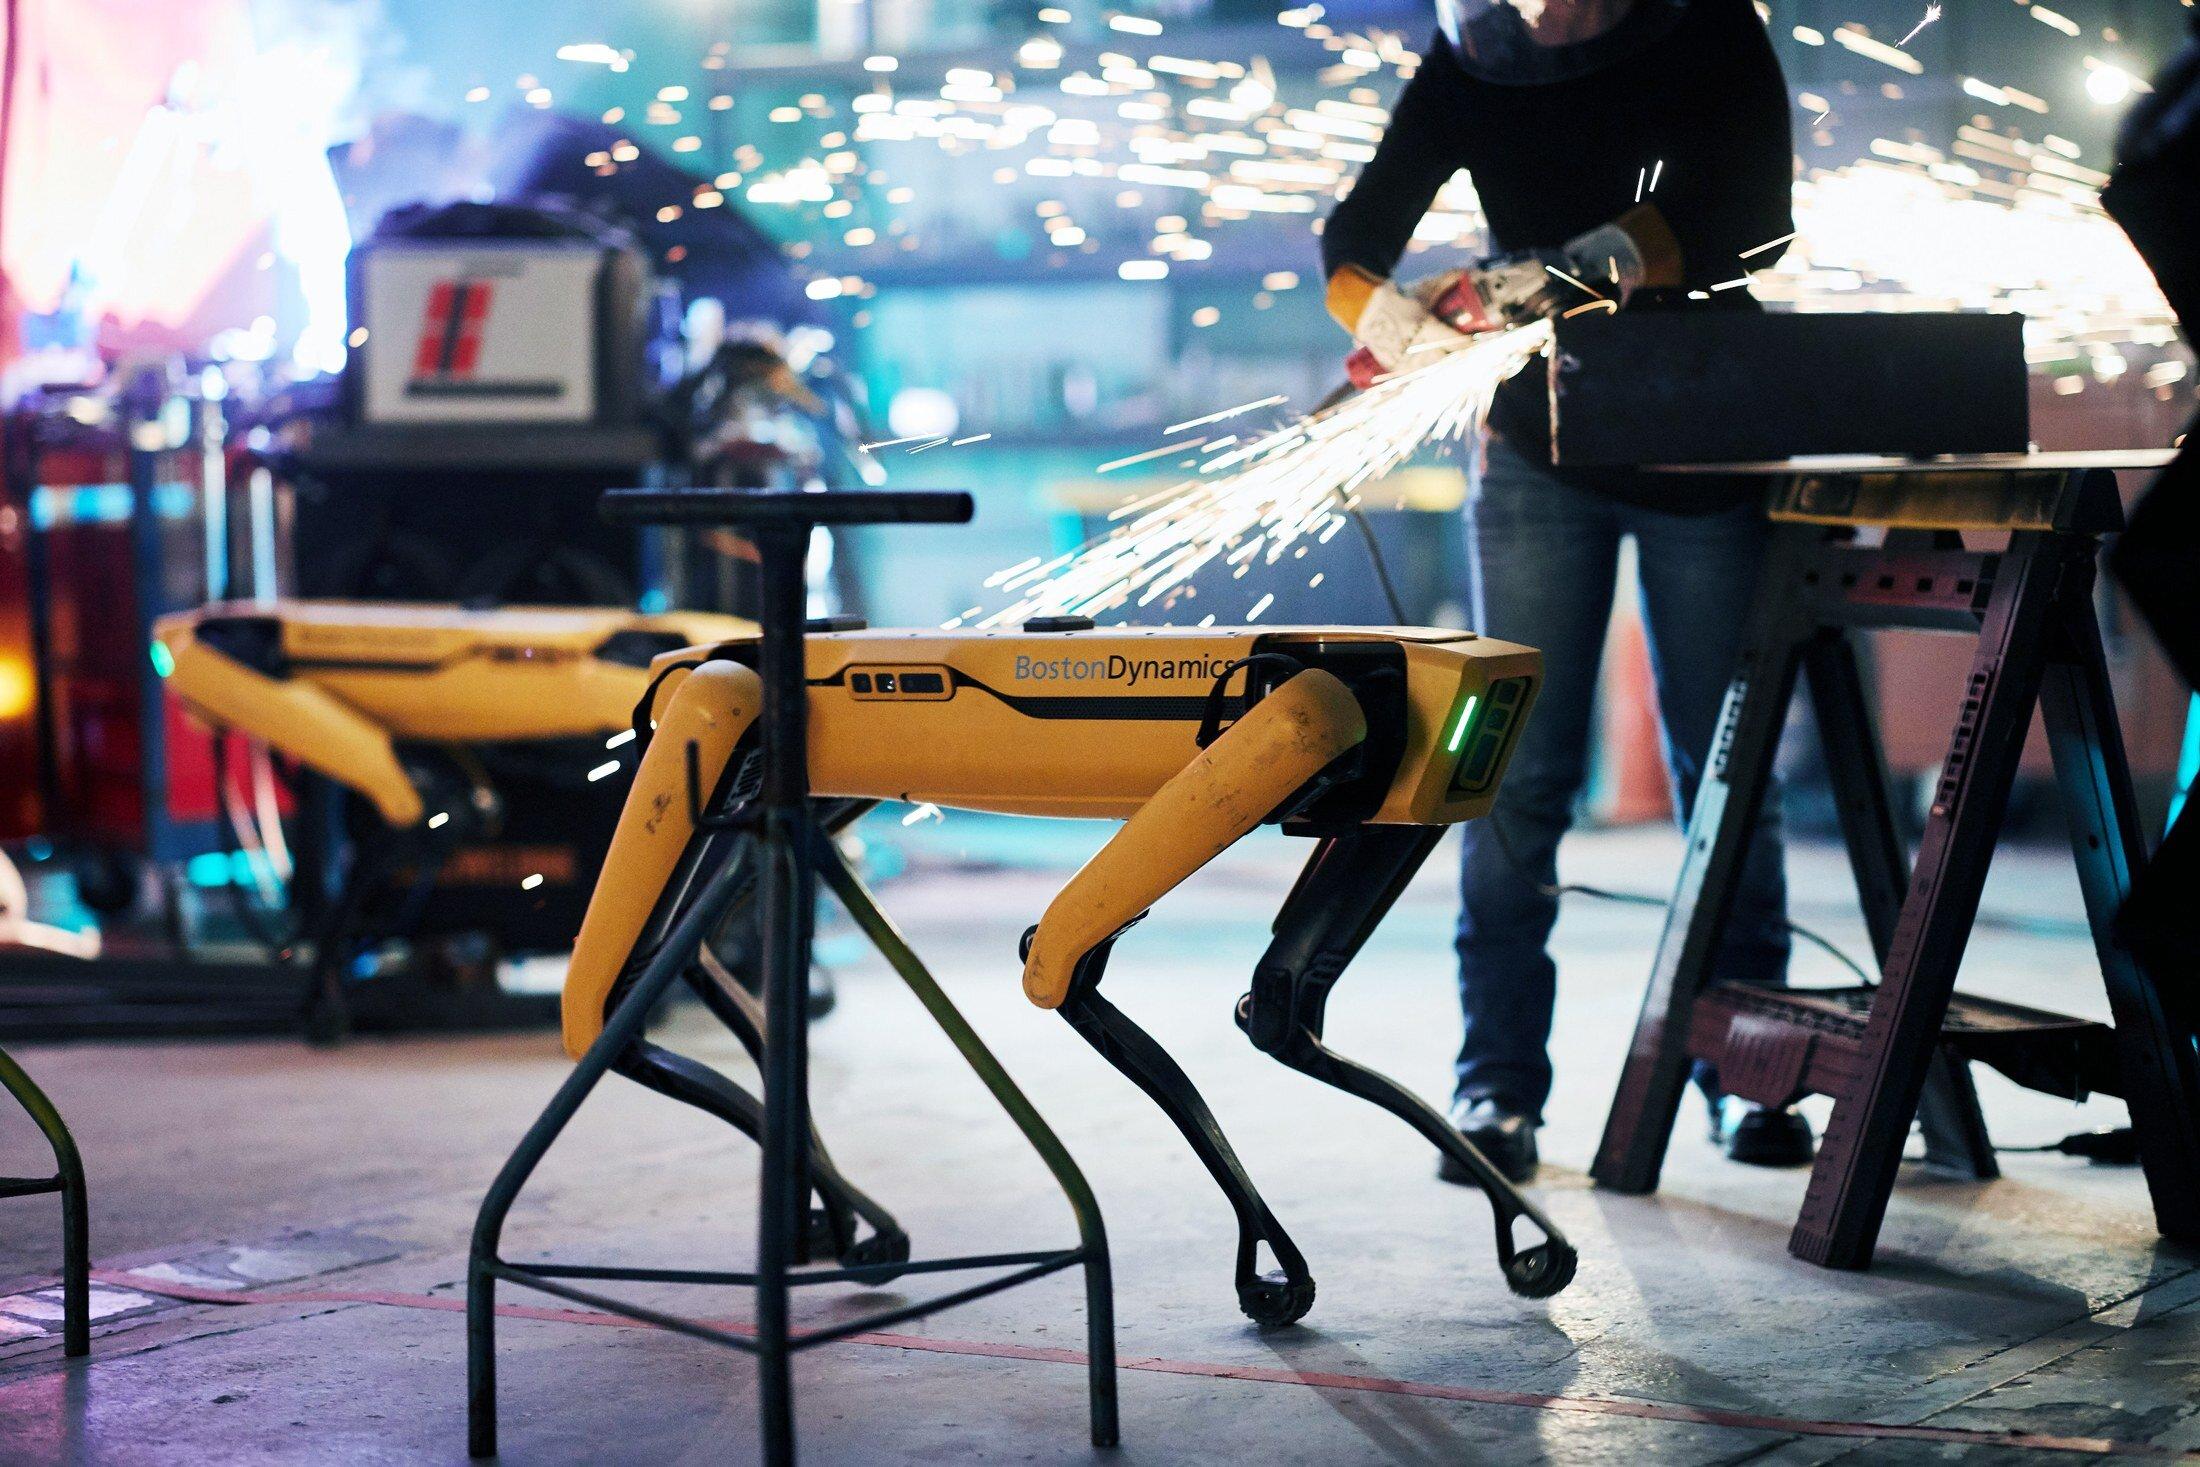 A robot dog is born!